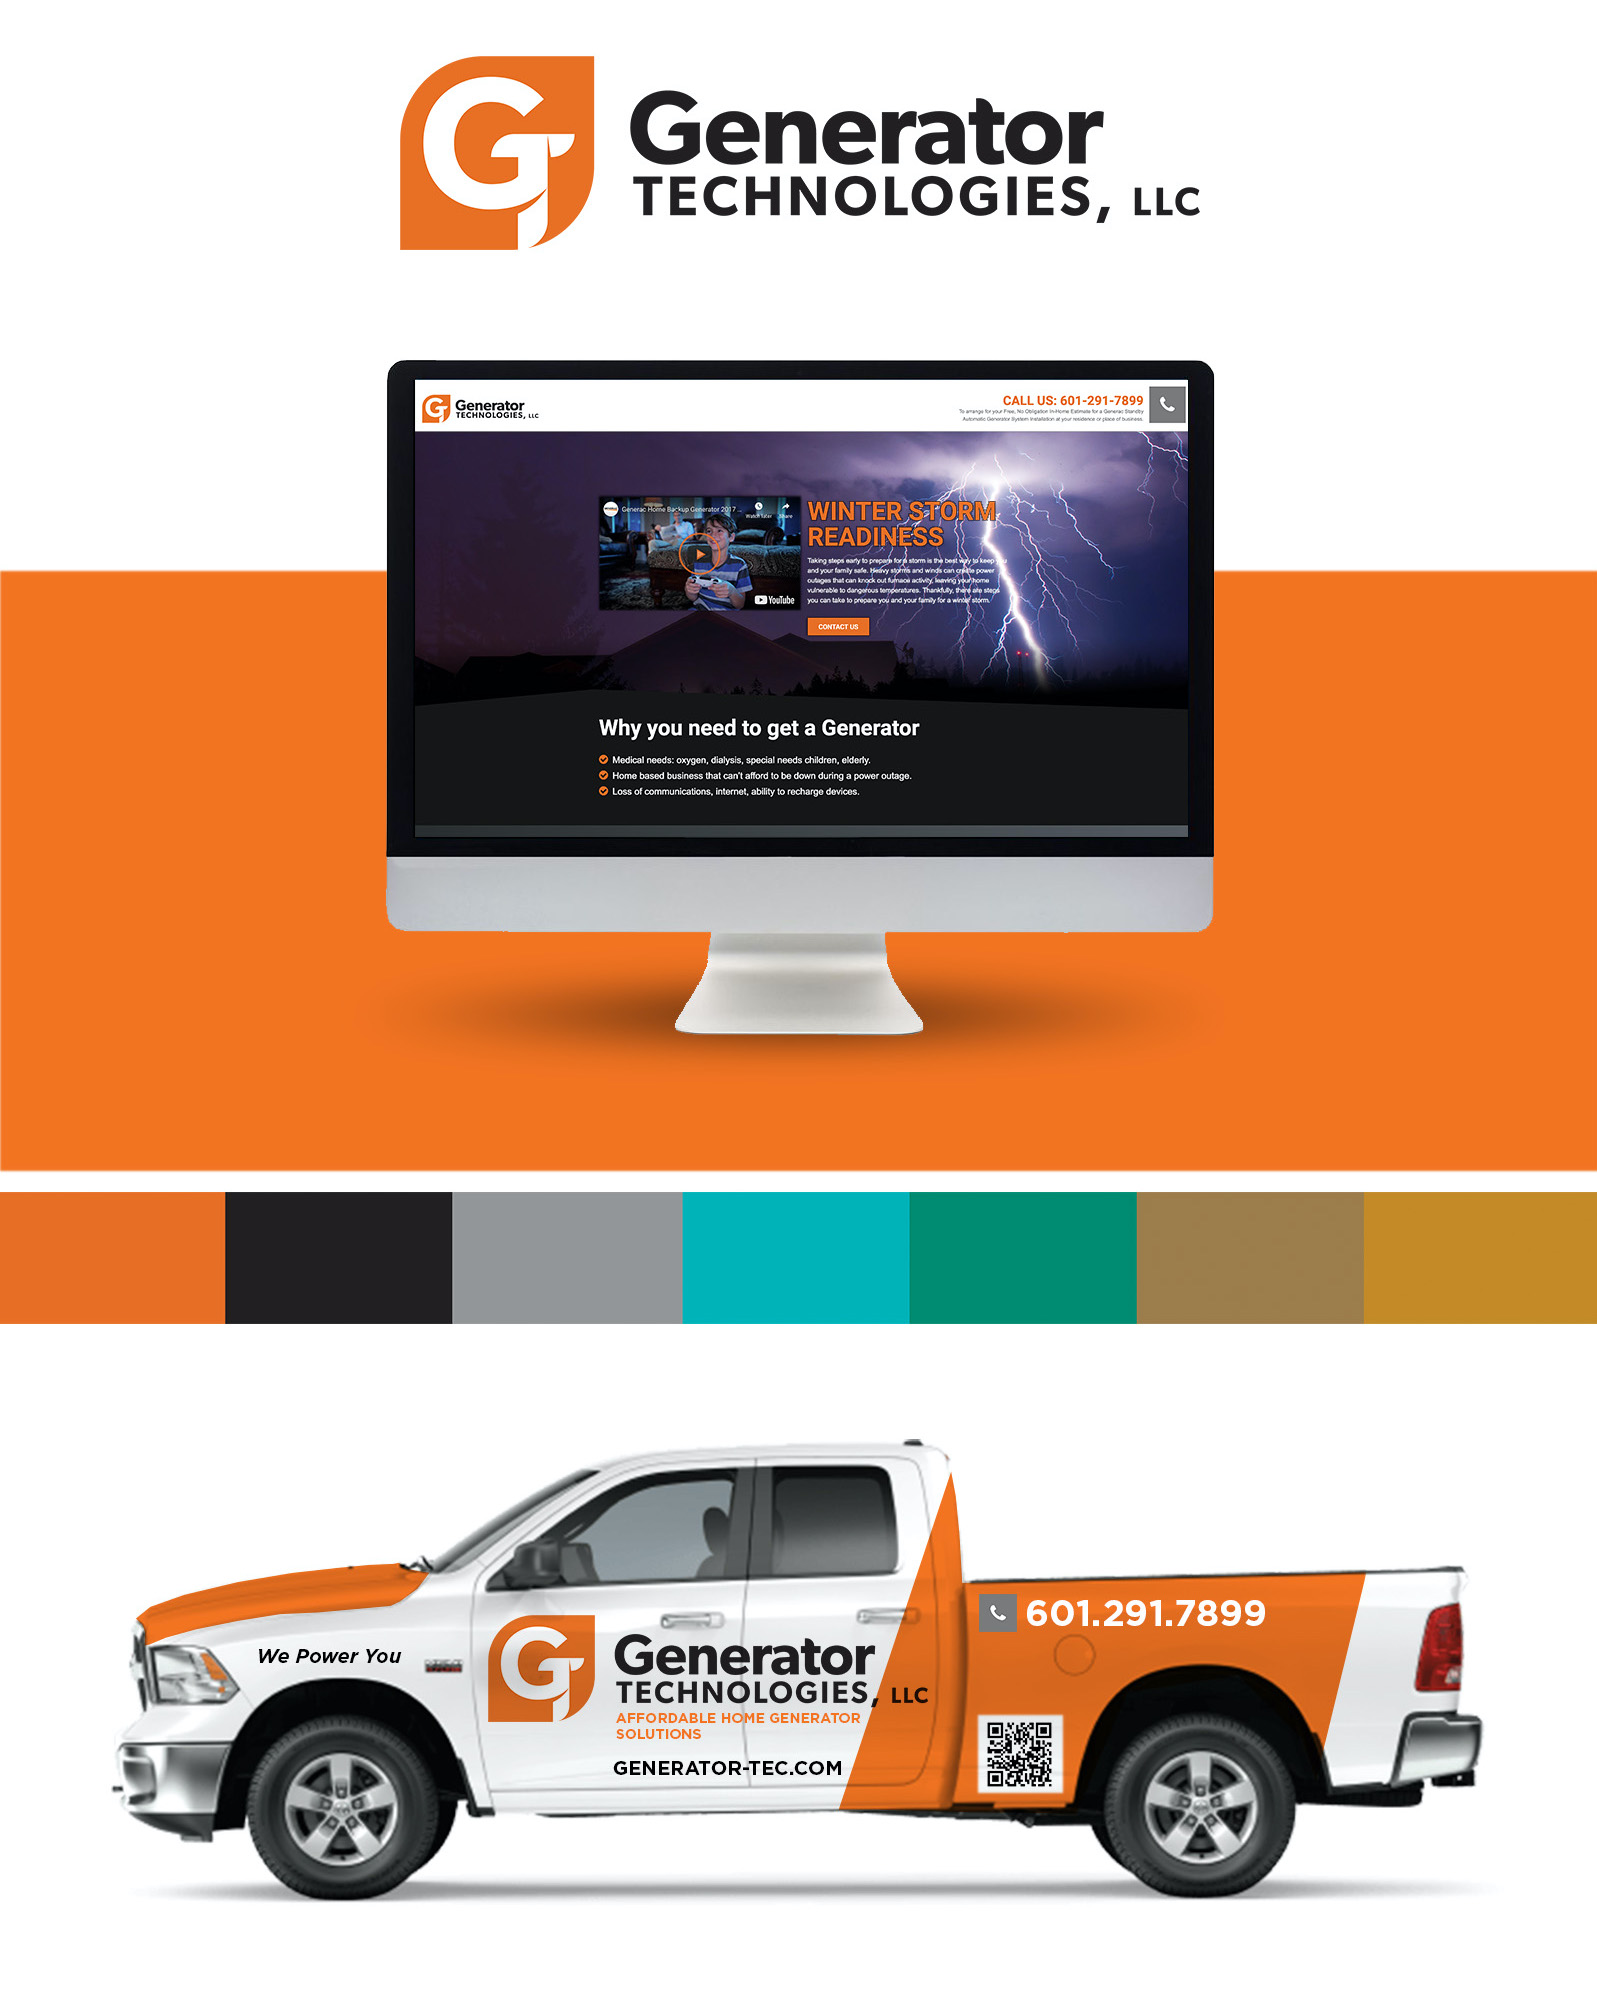 logo-design-generator-technologies-les-battles-sample-page